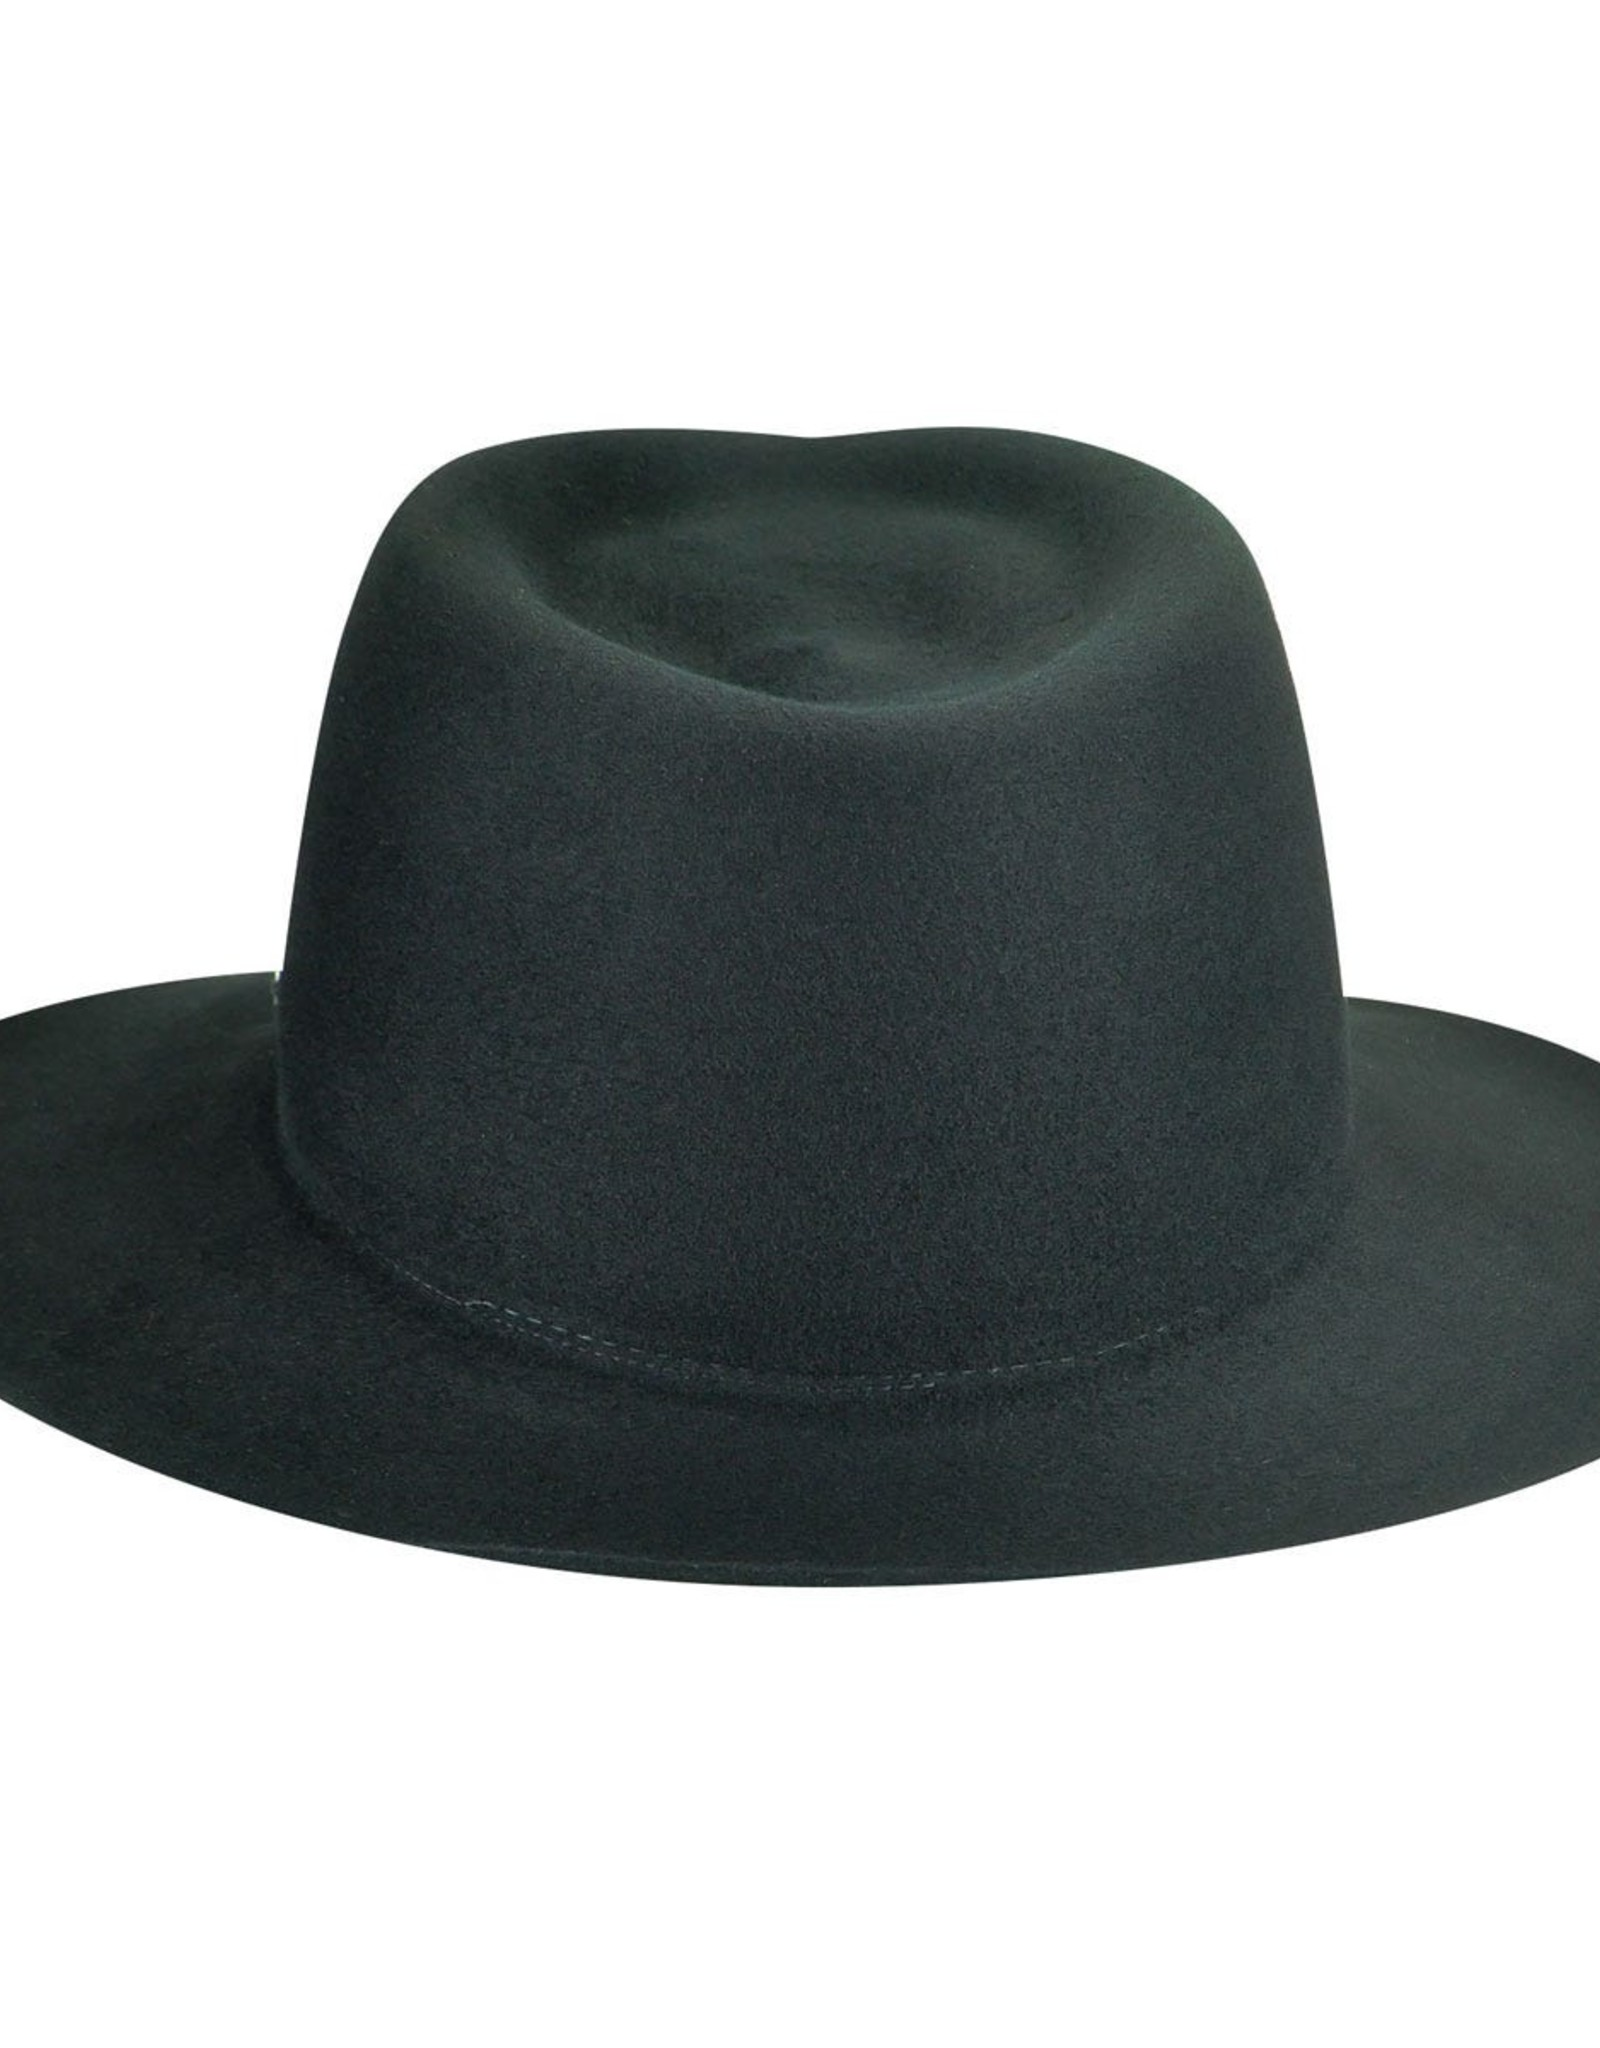 kangol Kangol barclay trilby hat black Large